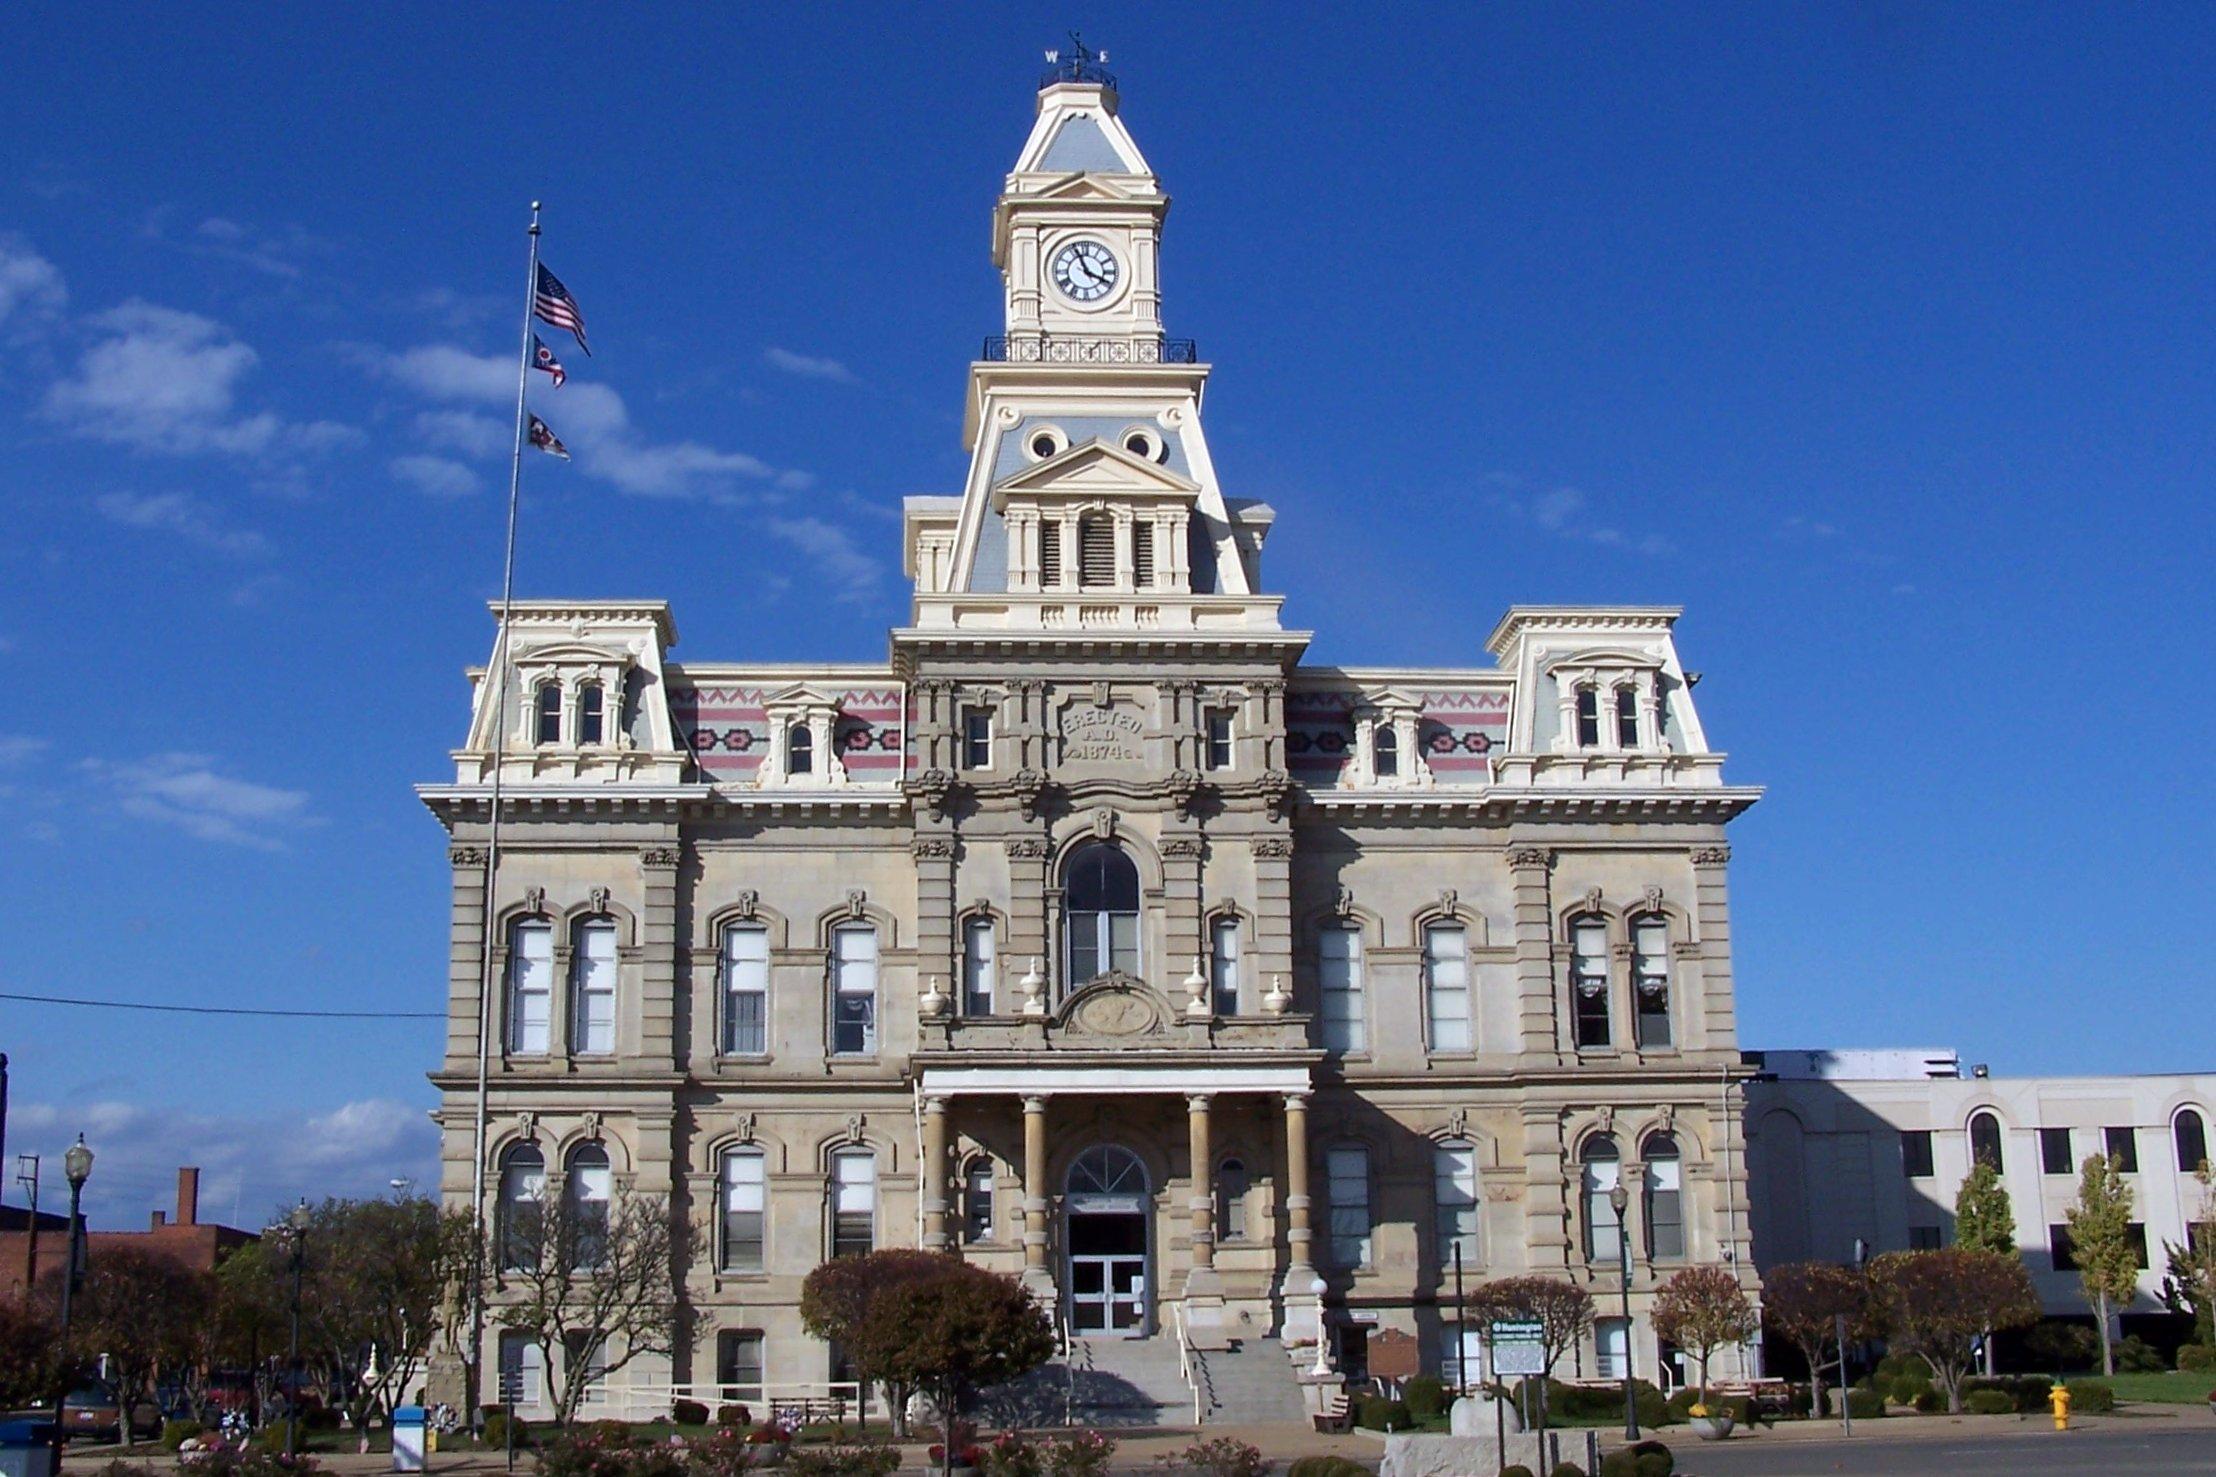 Ohio muskingum county new concord - Ohio Zanesville Muskingumcounty Usccohmuskingum Muskingum County Courthouse